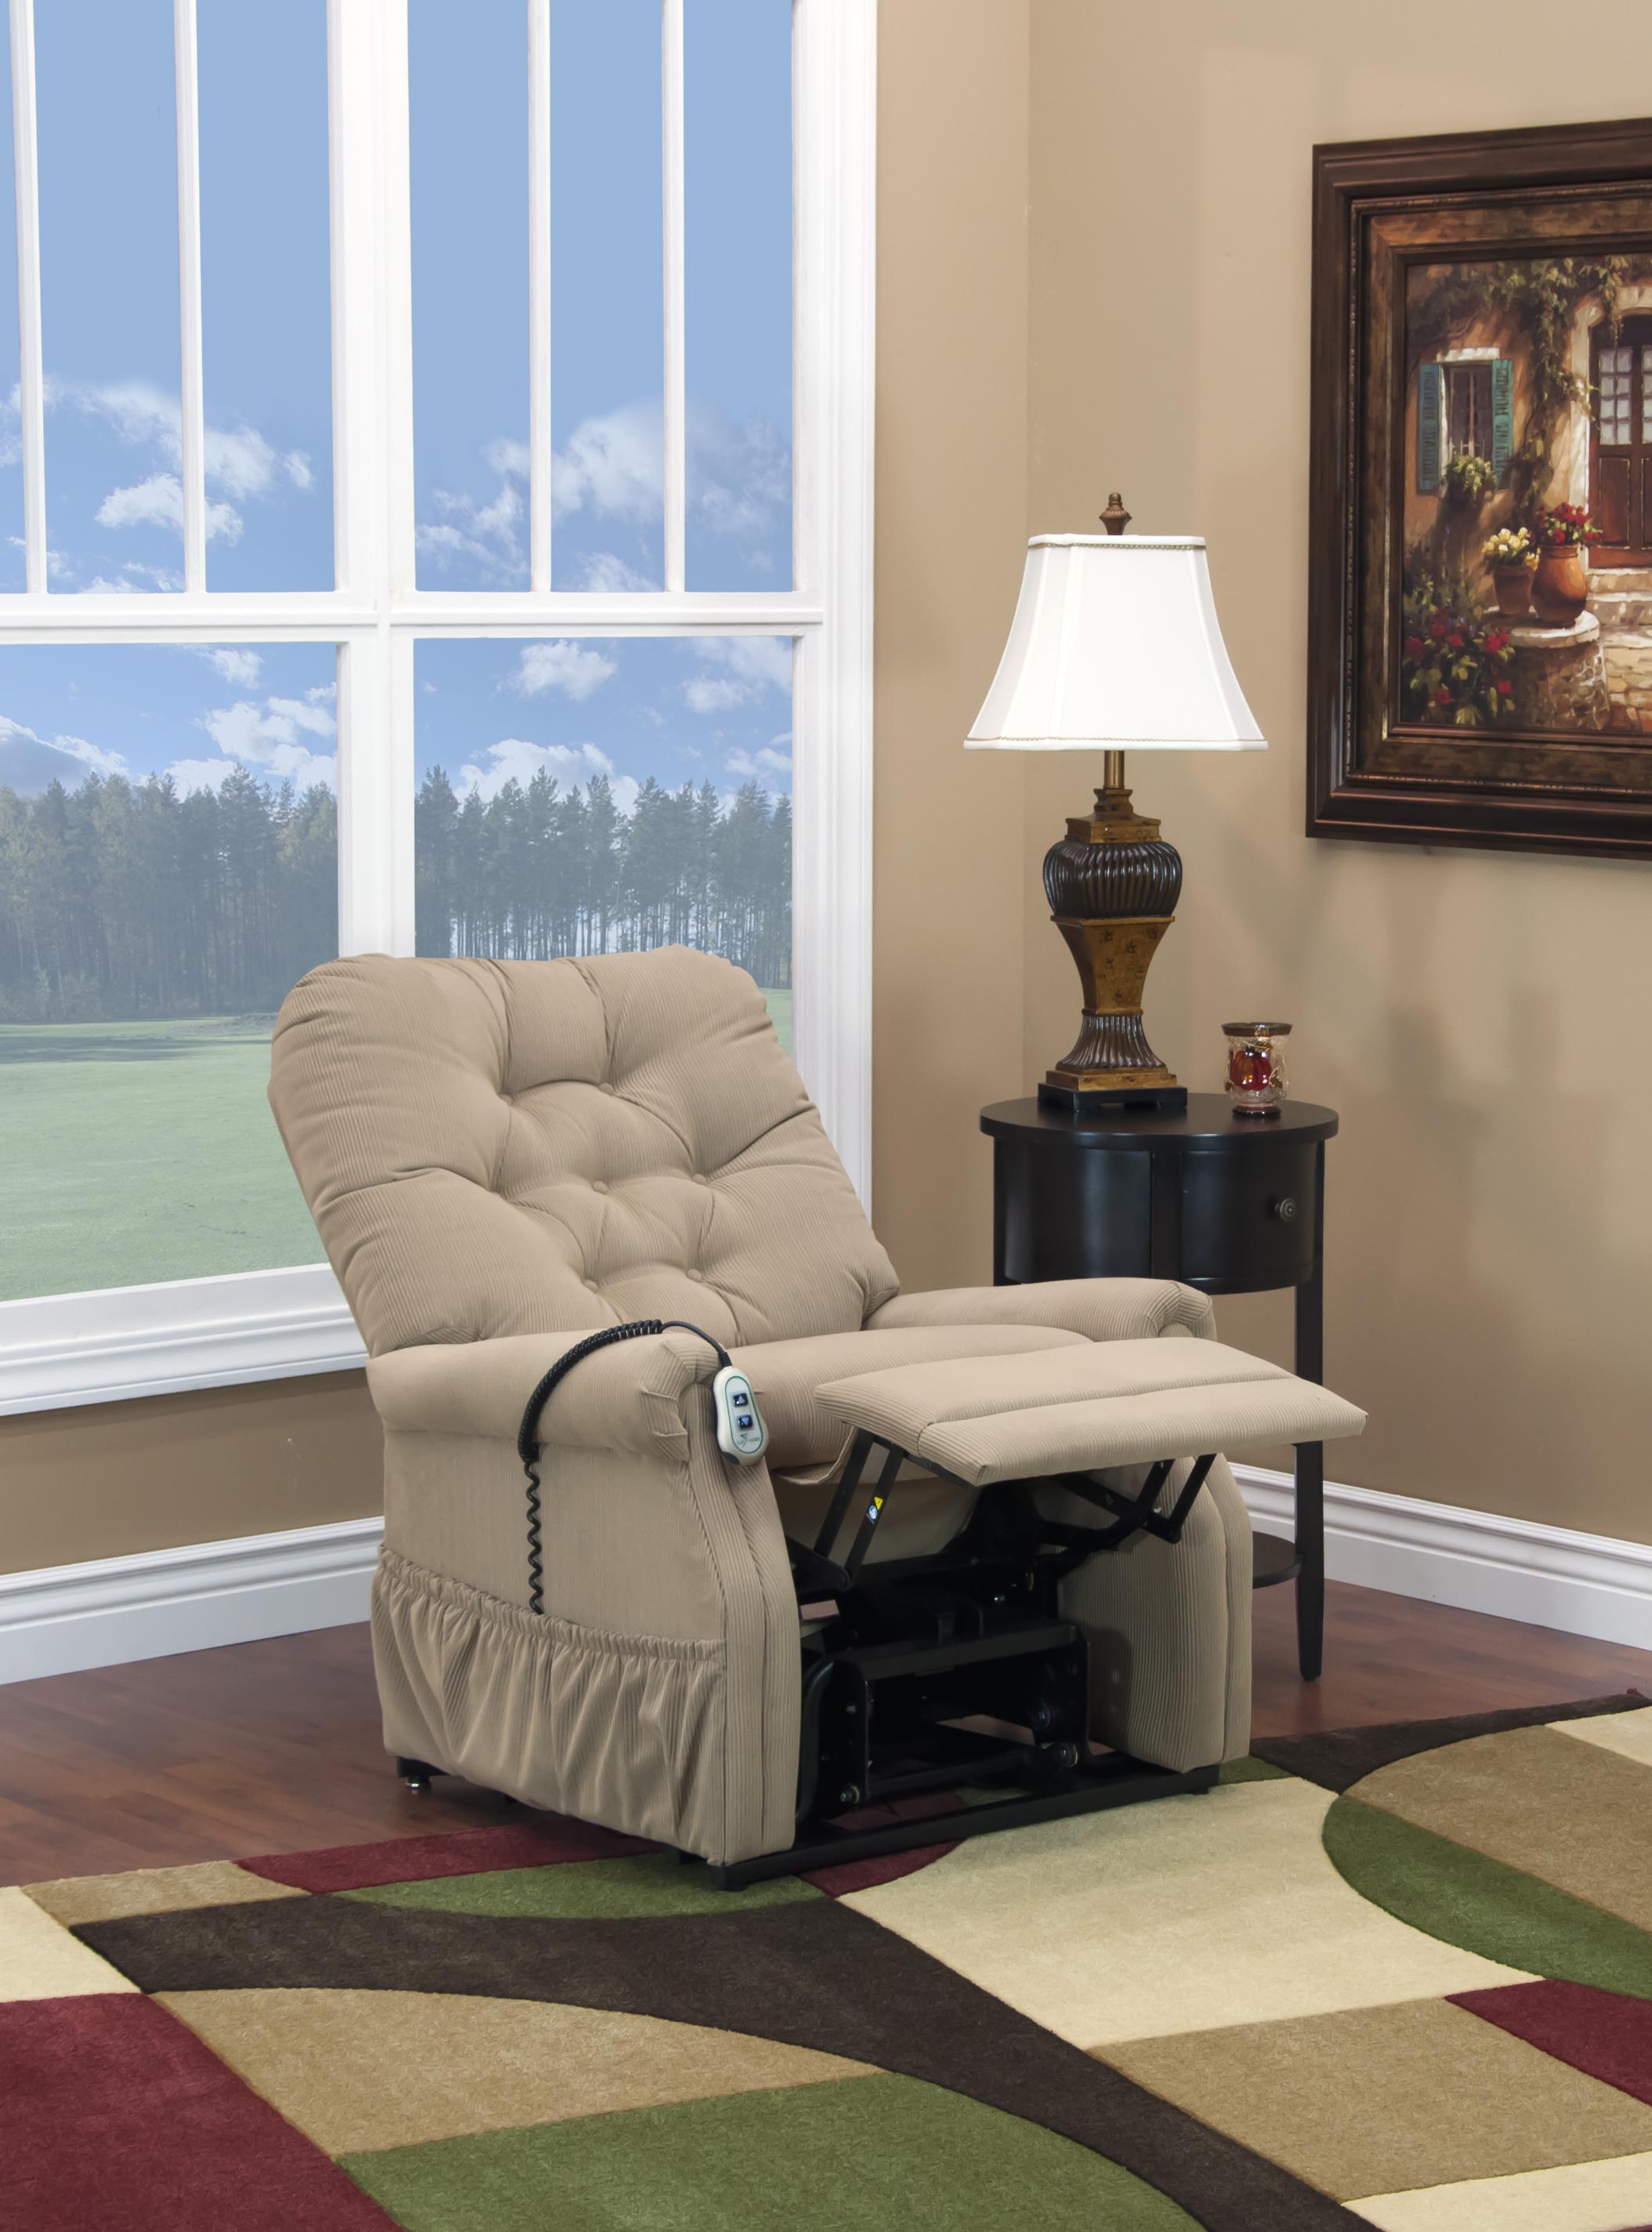 1555-aalb-aaron-lt.-brown-reclined.jpg